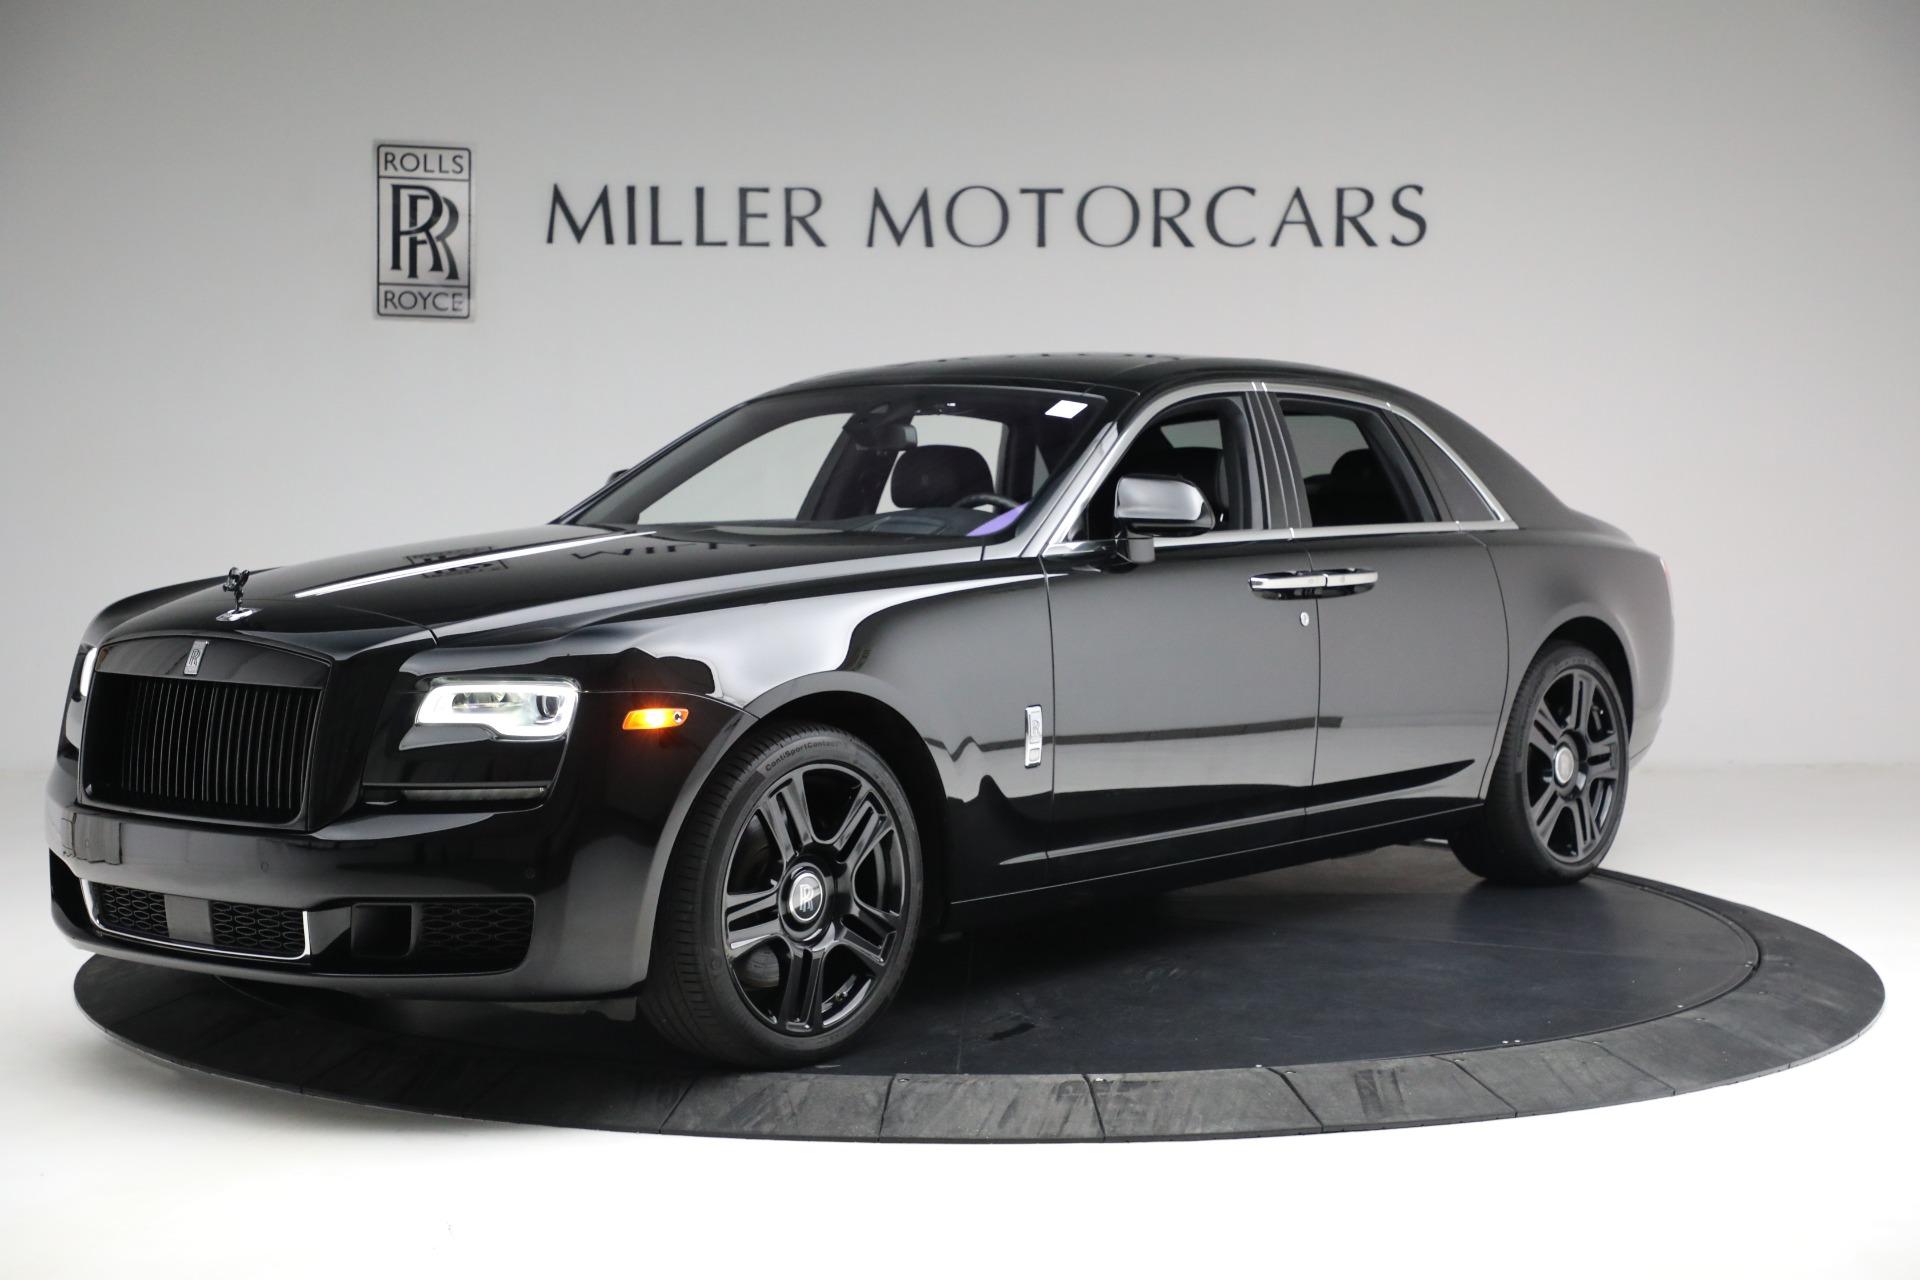 Used 2018 Rolls-Royce Ghost for sale $249,900 at Rolls-Royce Motor Cars Greenwich in Greenwich CT 06830 1